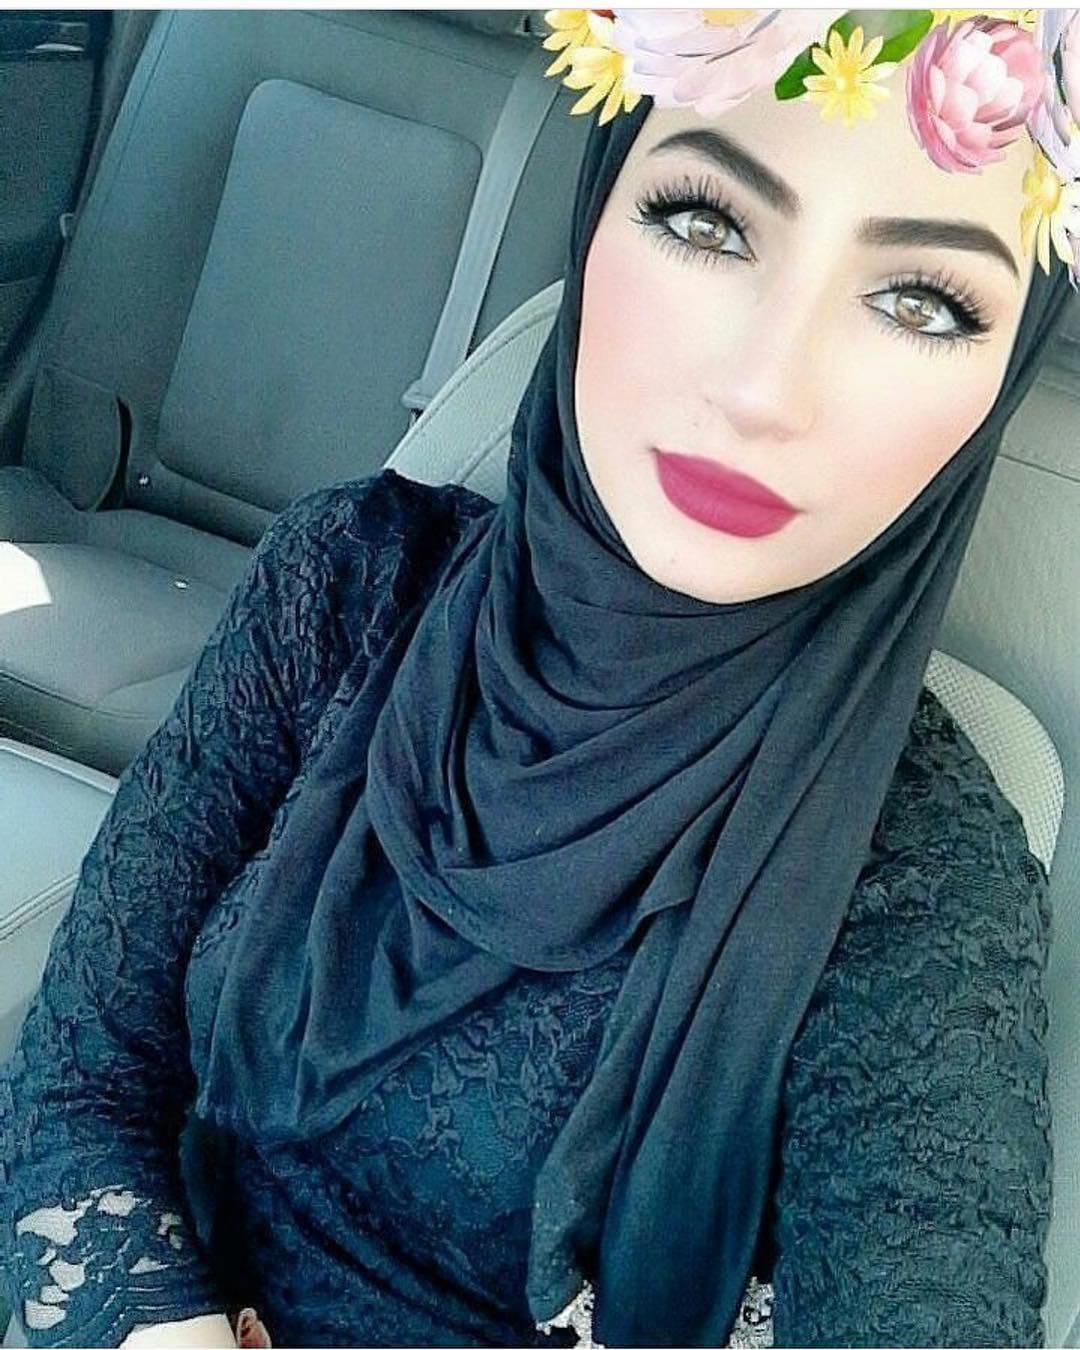 صور بنت مصر , اجمل صور بنات فى مصر